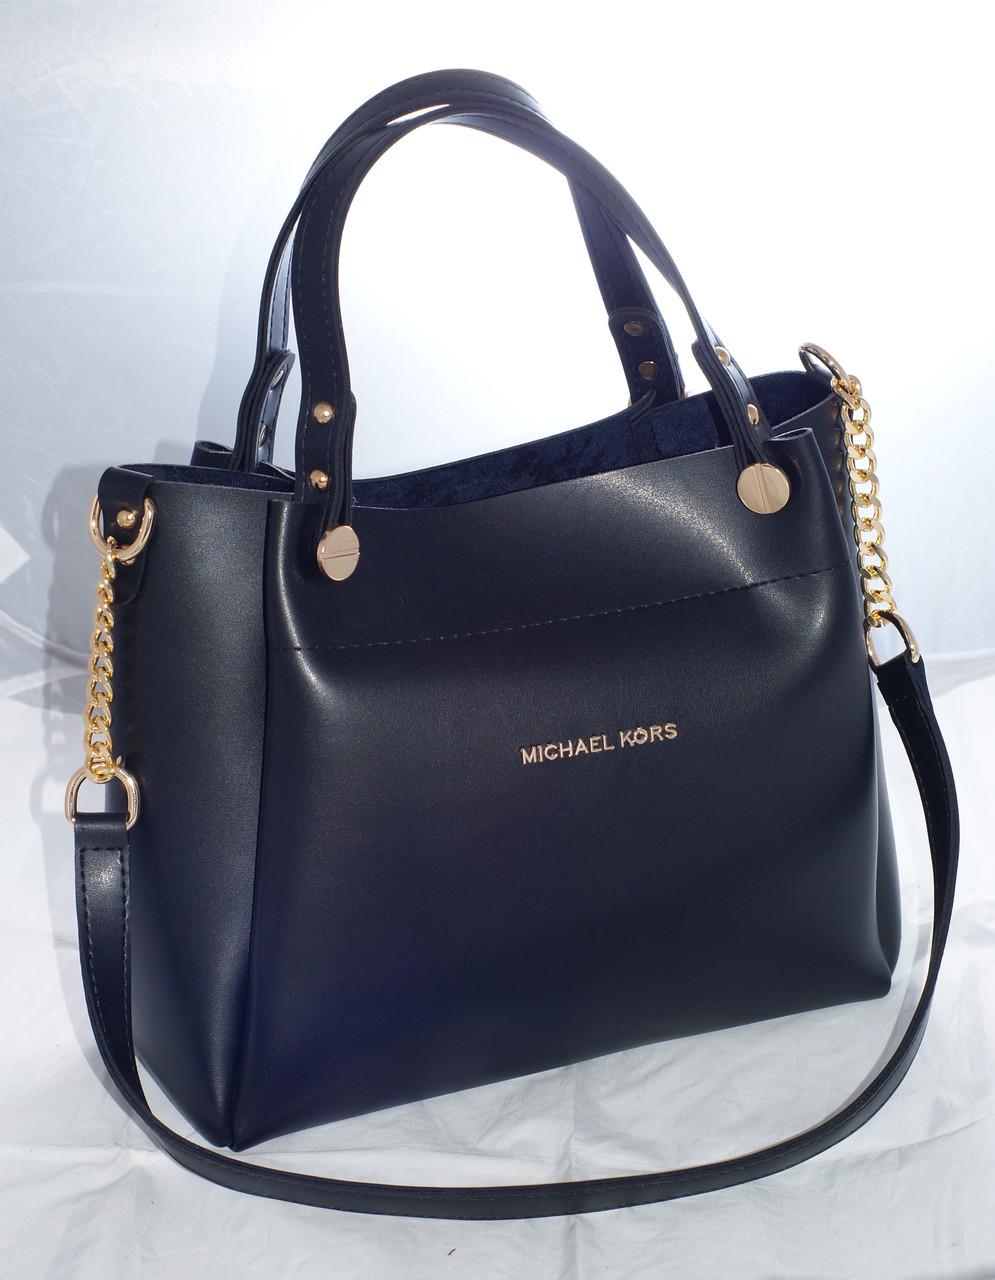 Женская сумкаMichael Kors (Майкл Корс),черная